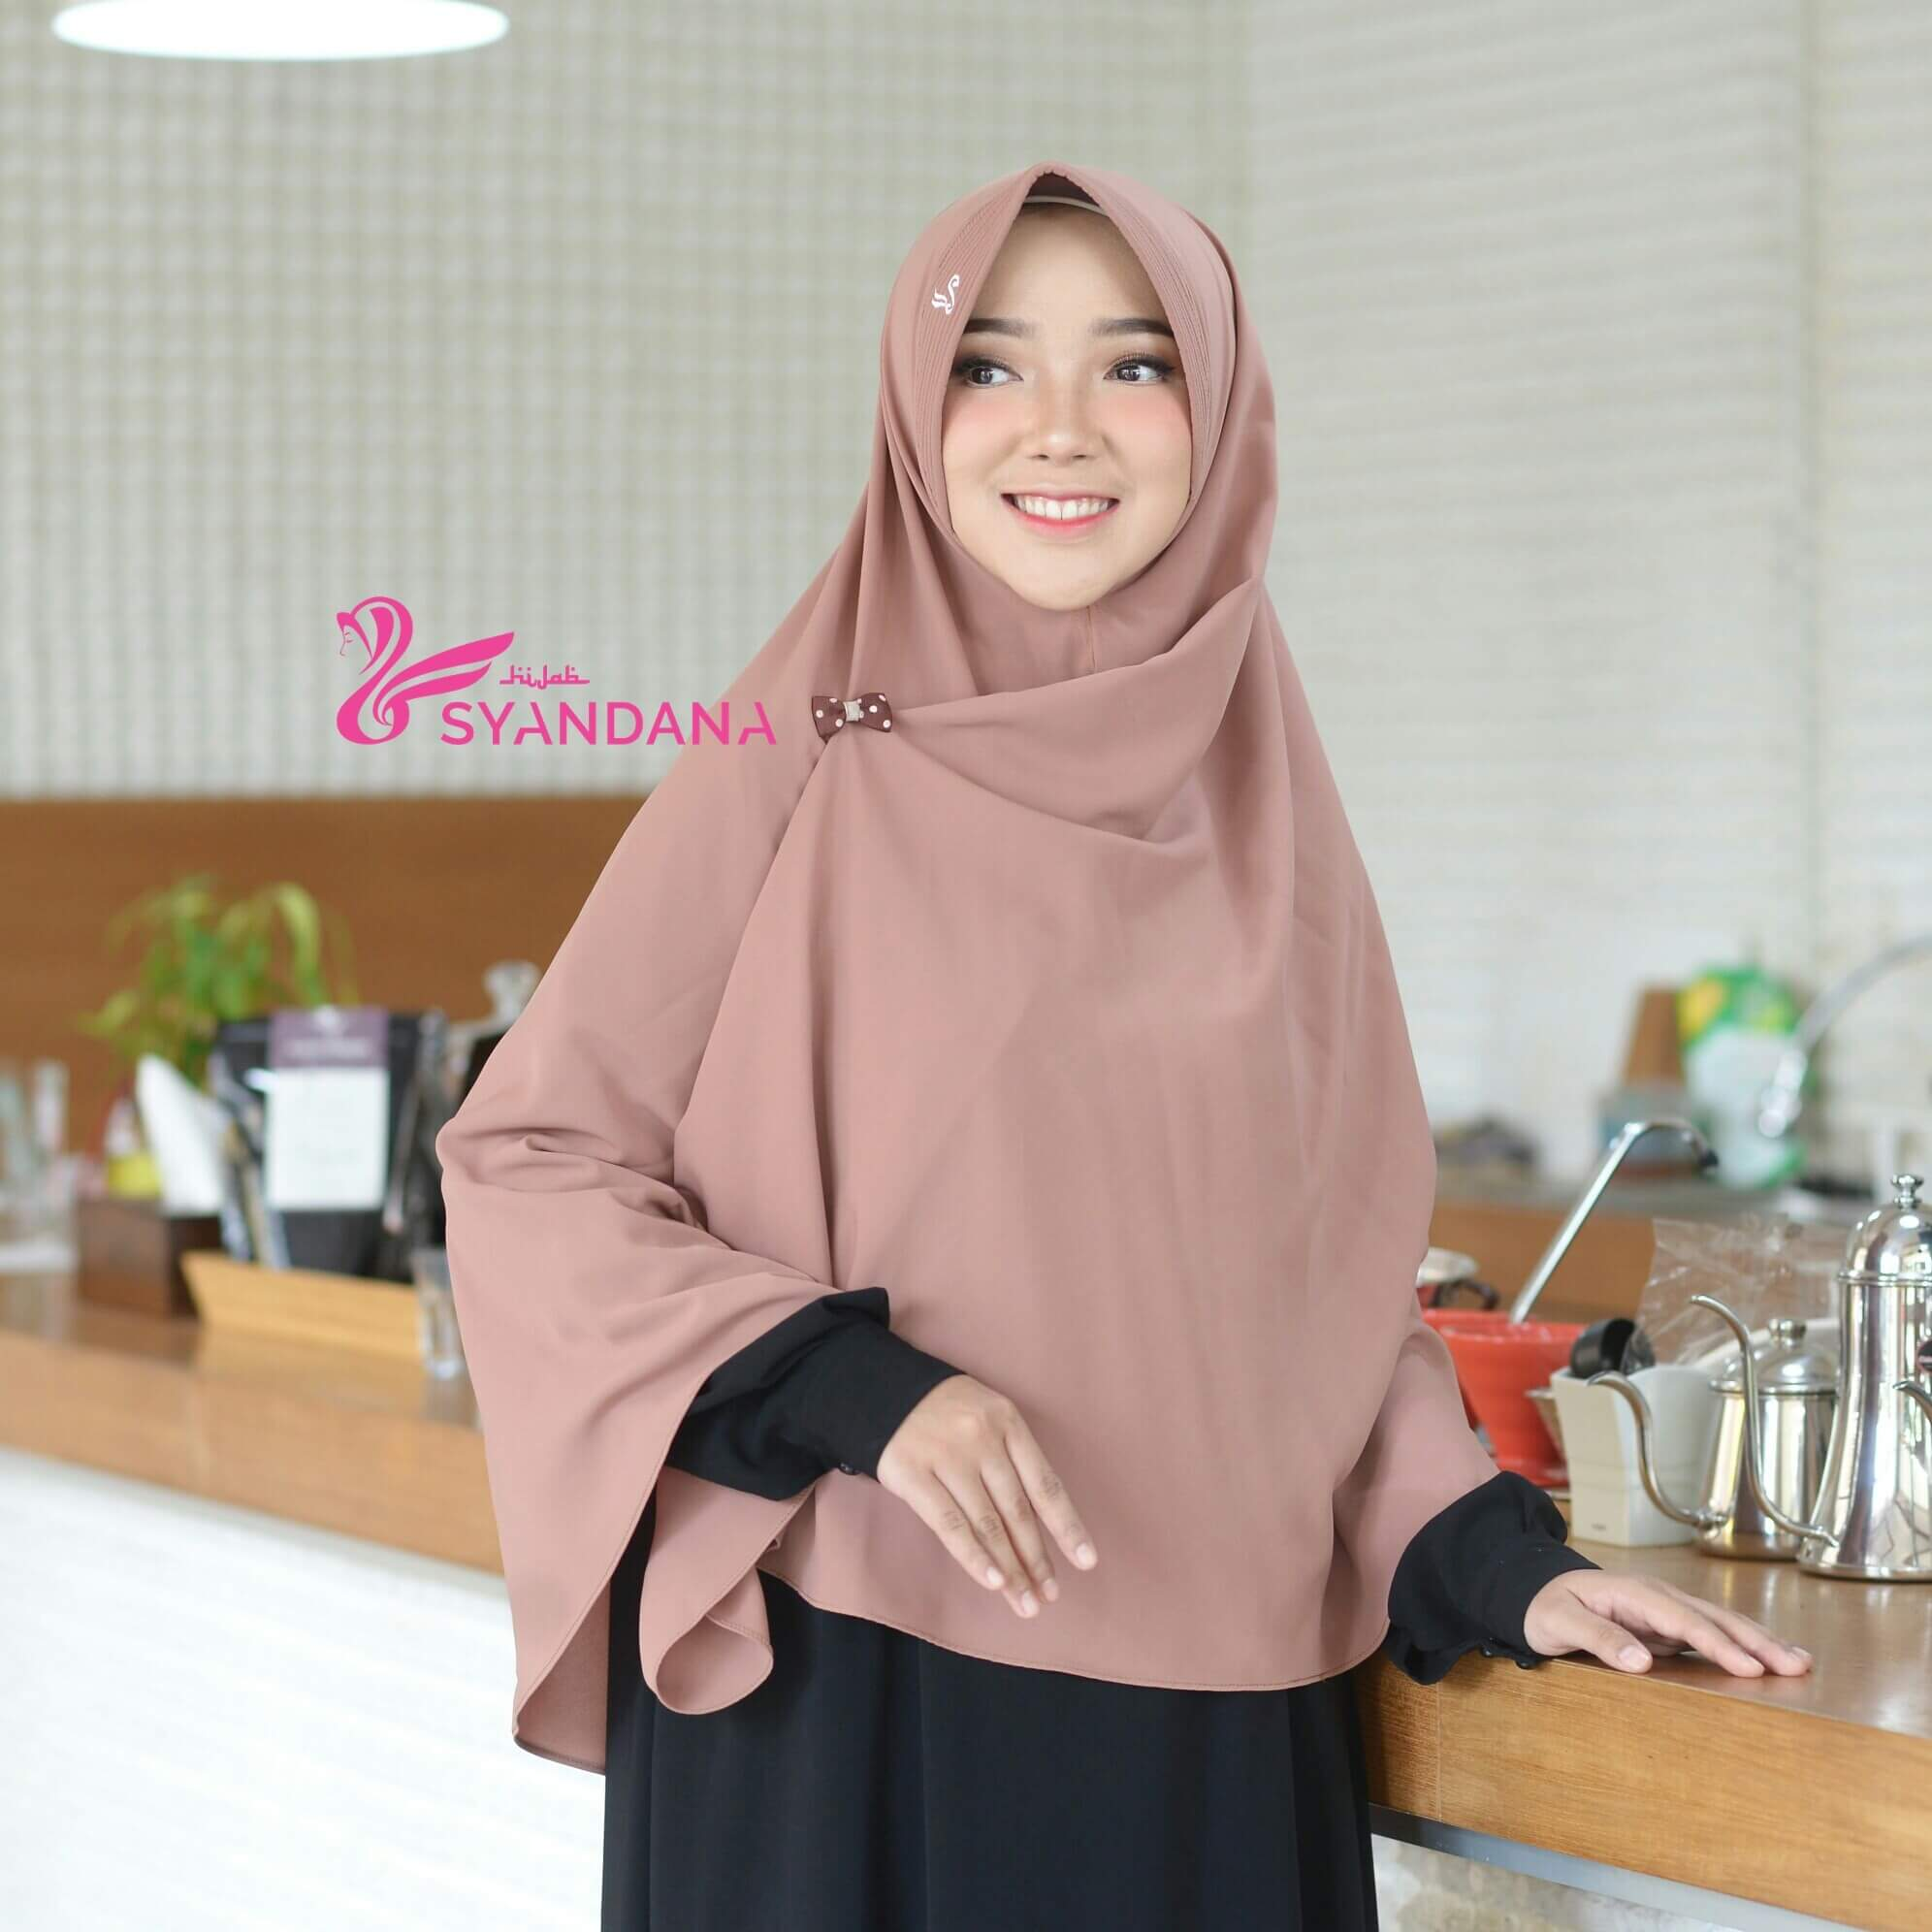 Katalog Hijab Syandana Jilbab Bergo Jual Syari Gosya Mocca